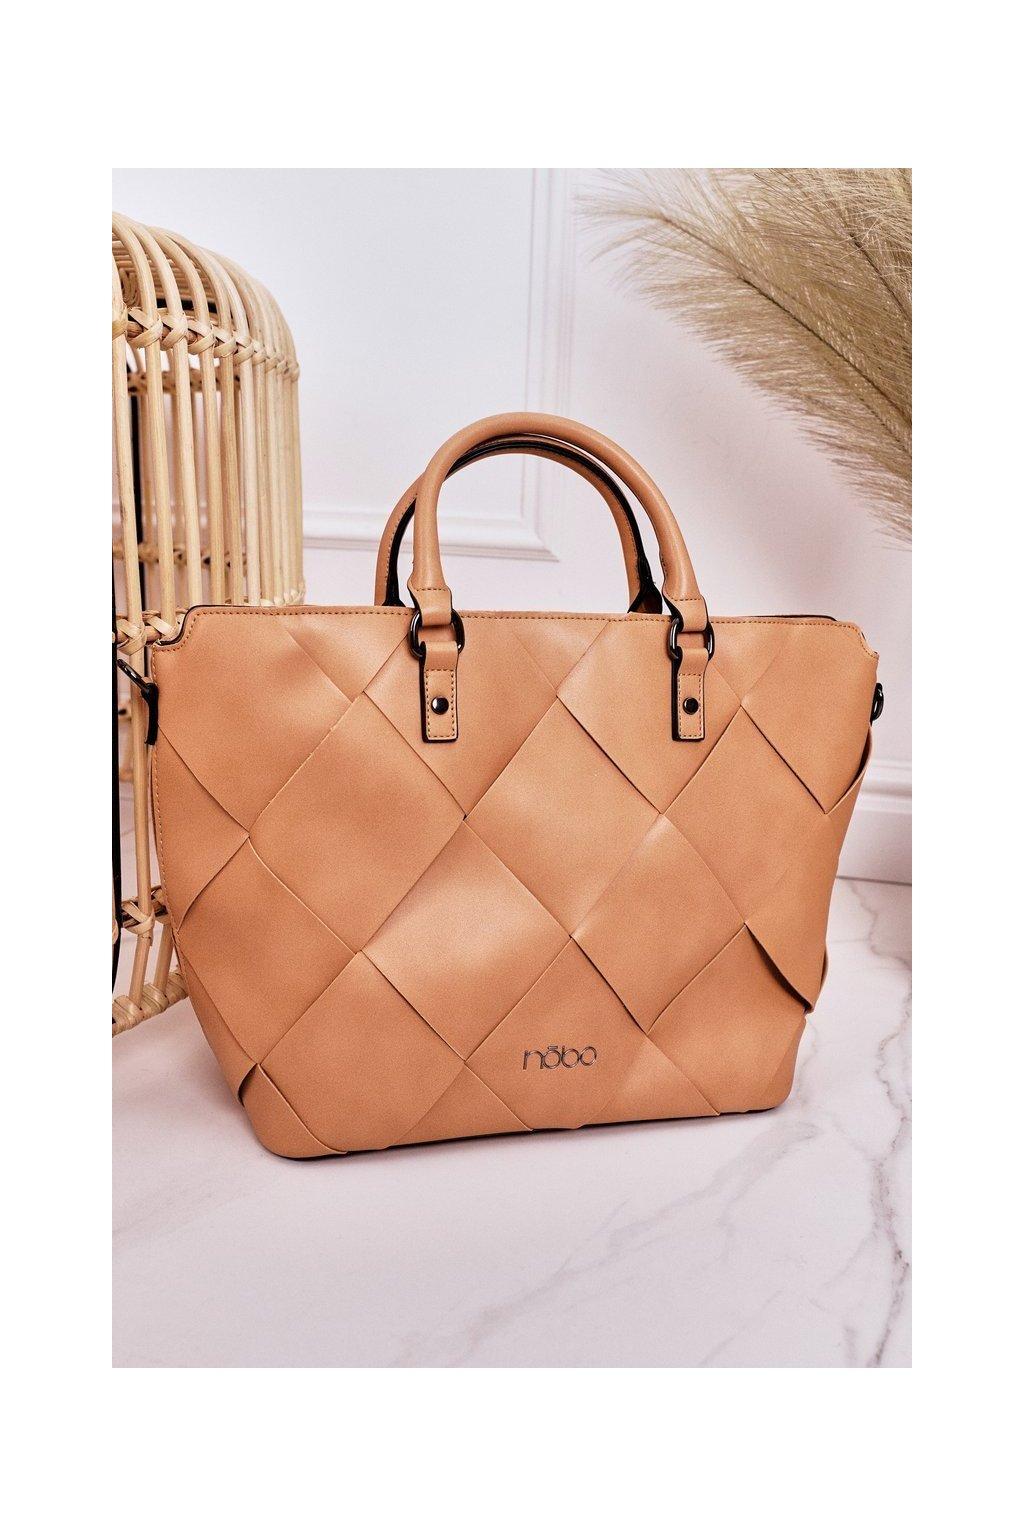 Dámska kabelka hnedá kód kabelky NBAG-K1250-C015 BEIGE